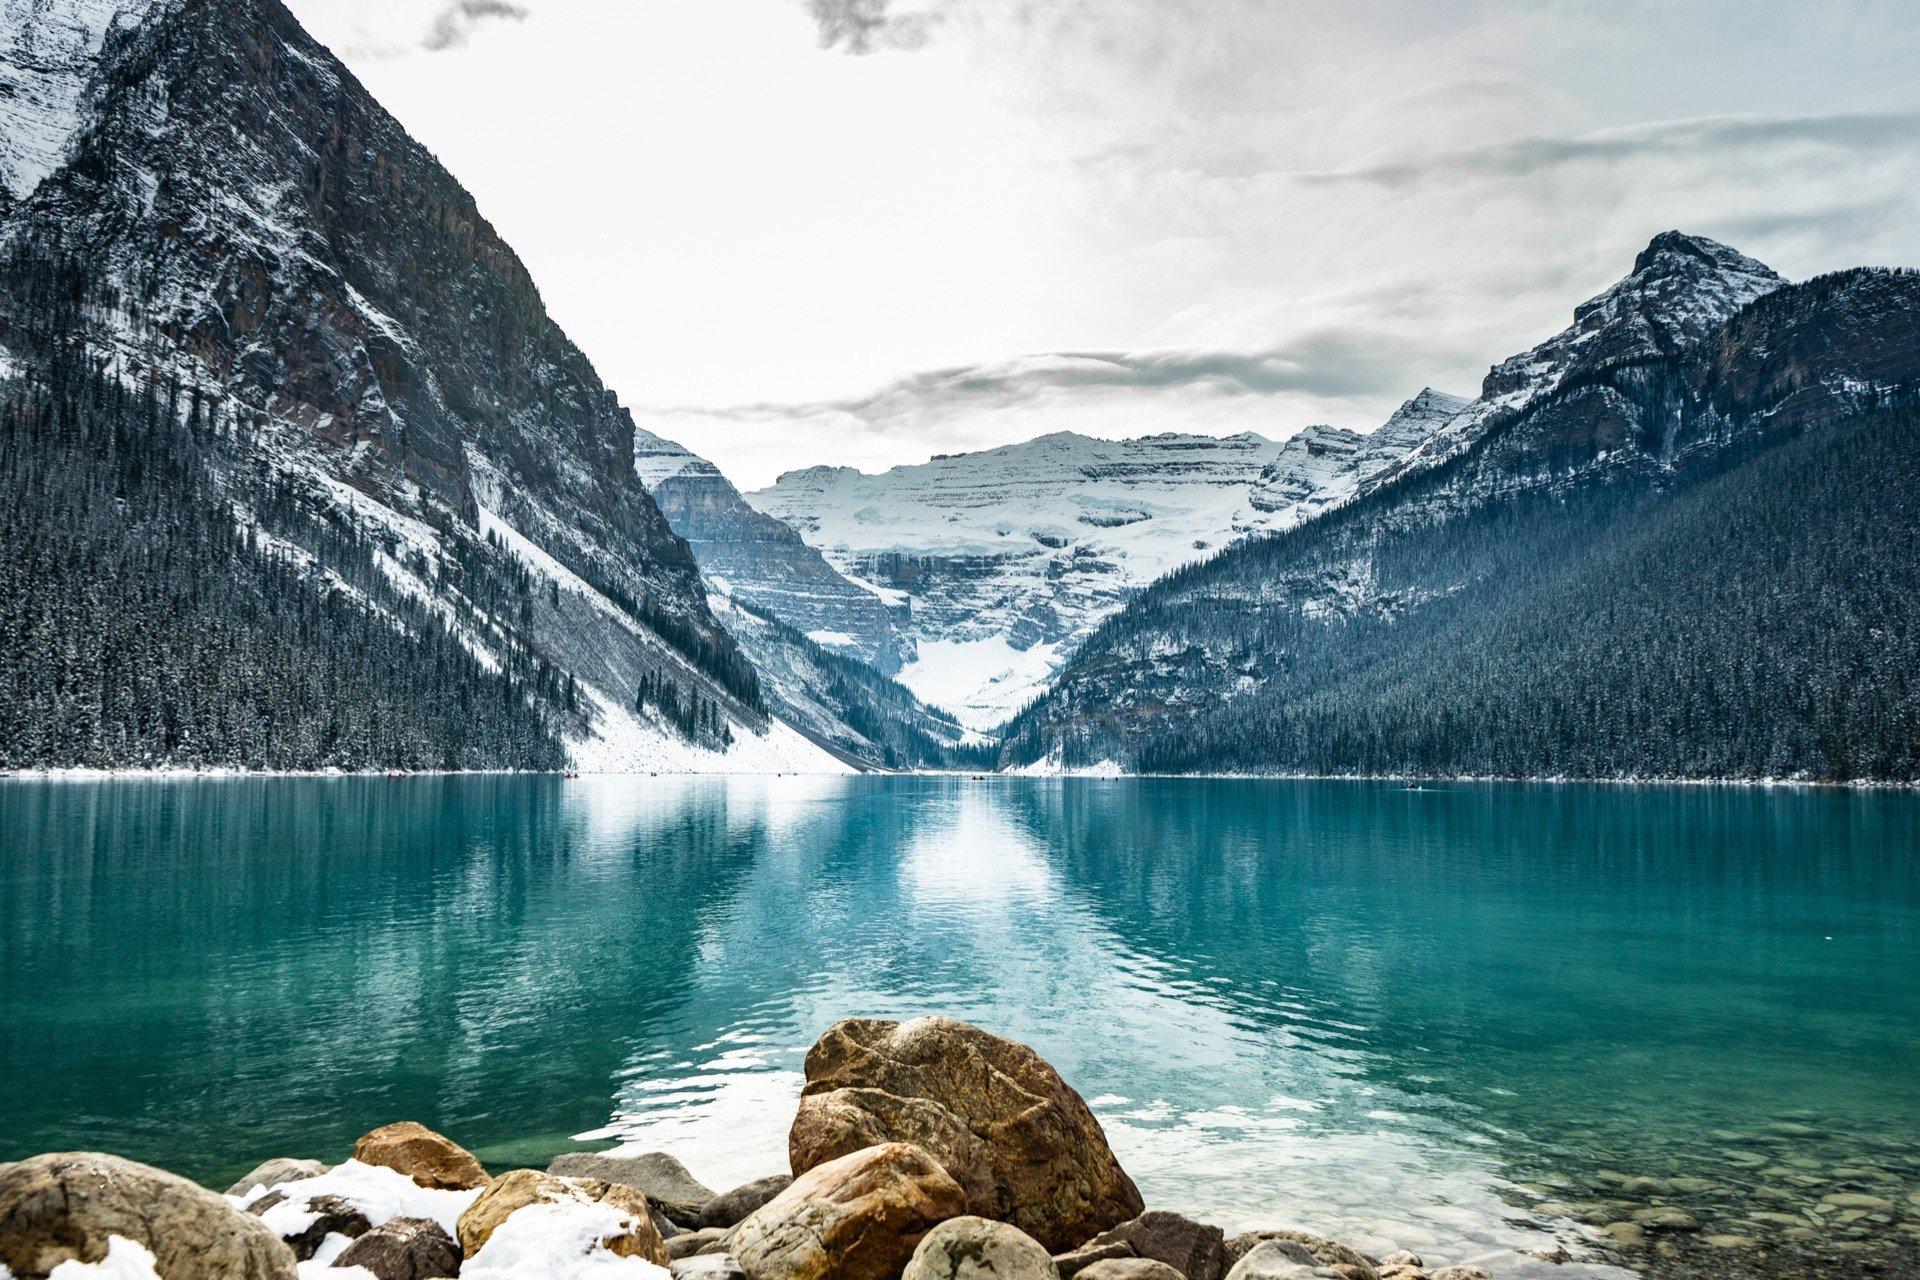 lake below snowy rocky mountains near invermere